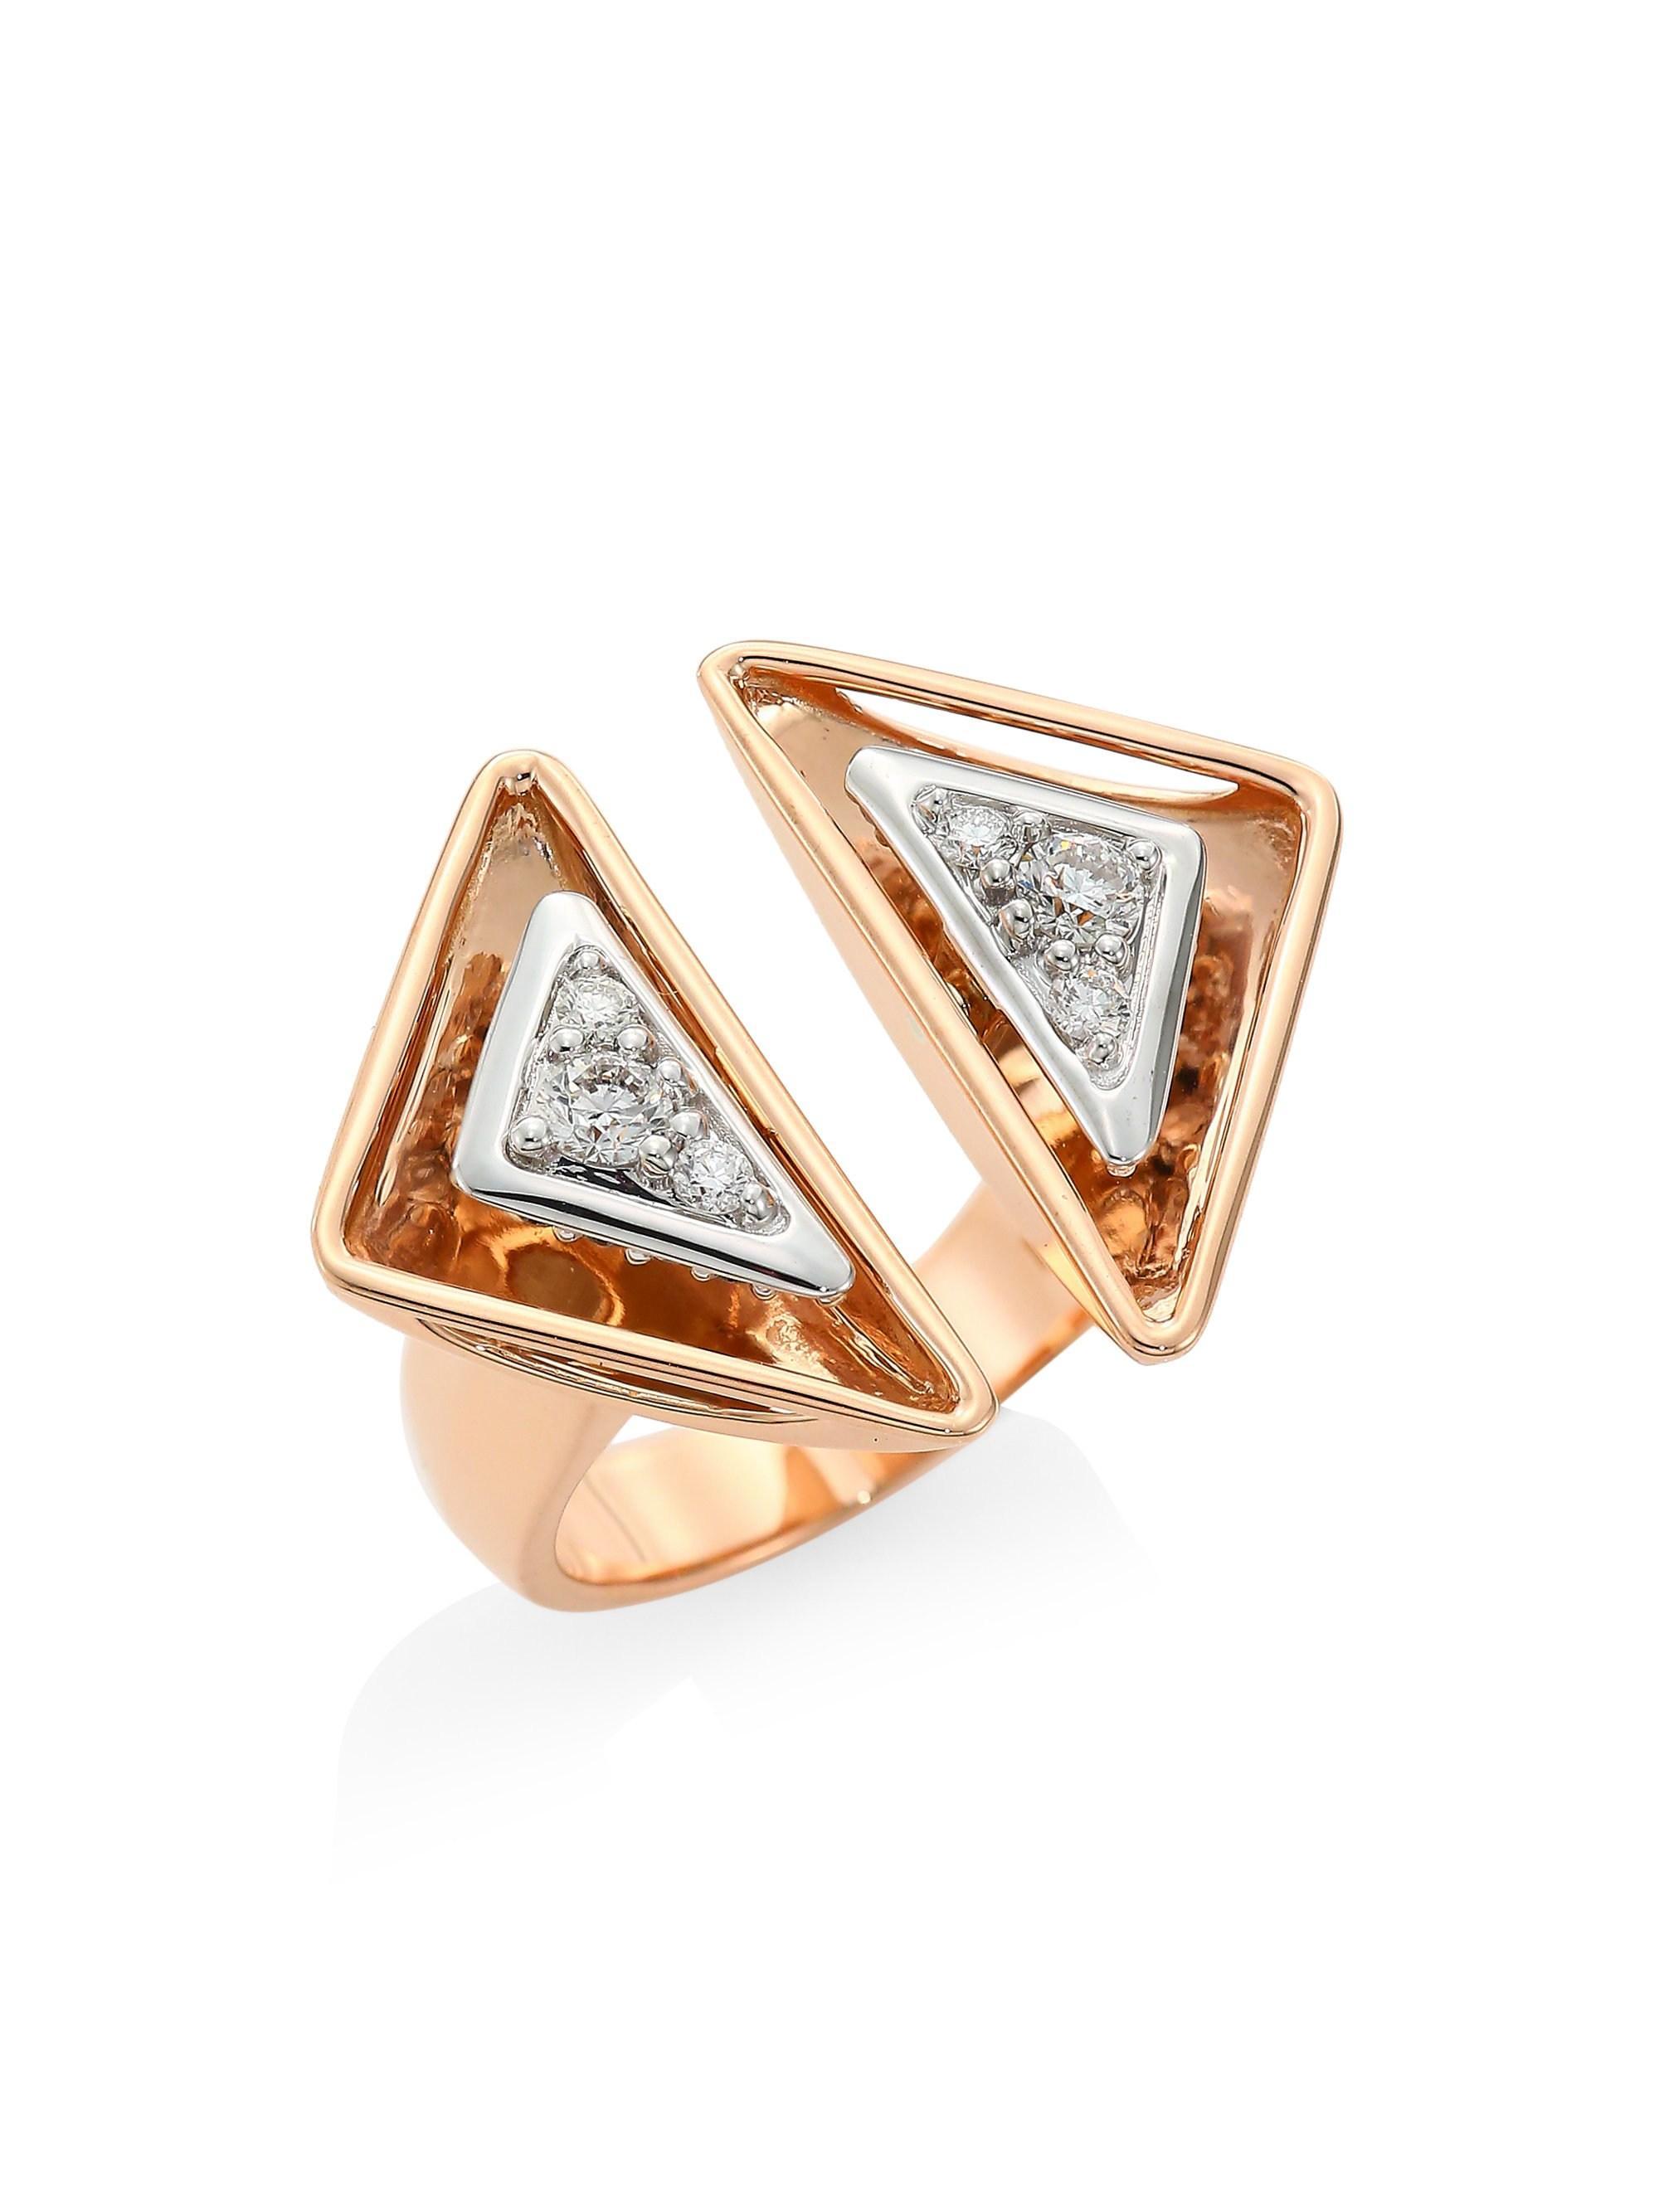 Lyst - Plevé Aura 18k Rose Gold & Diamond Triangle Cocktail